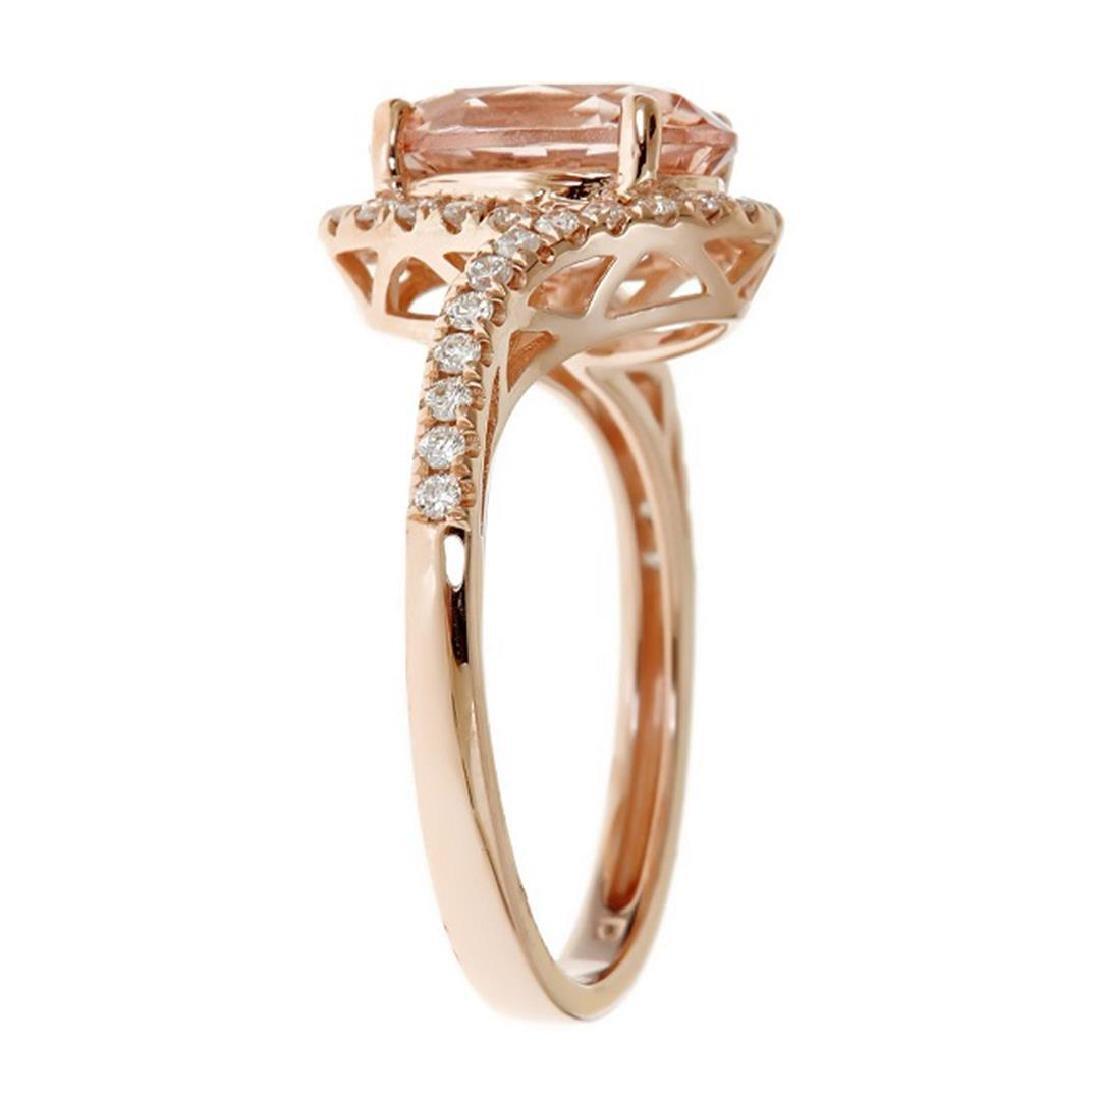 2.09 ctw Morganite and Diamond Ring - 14KT Rose Gold - 2